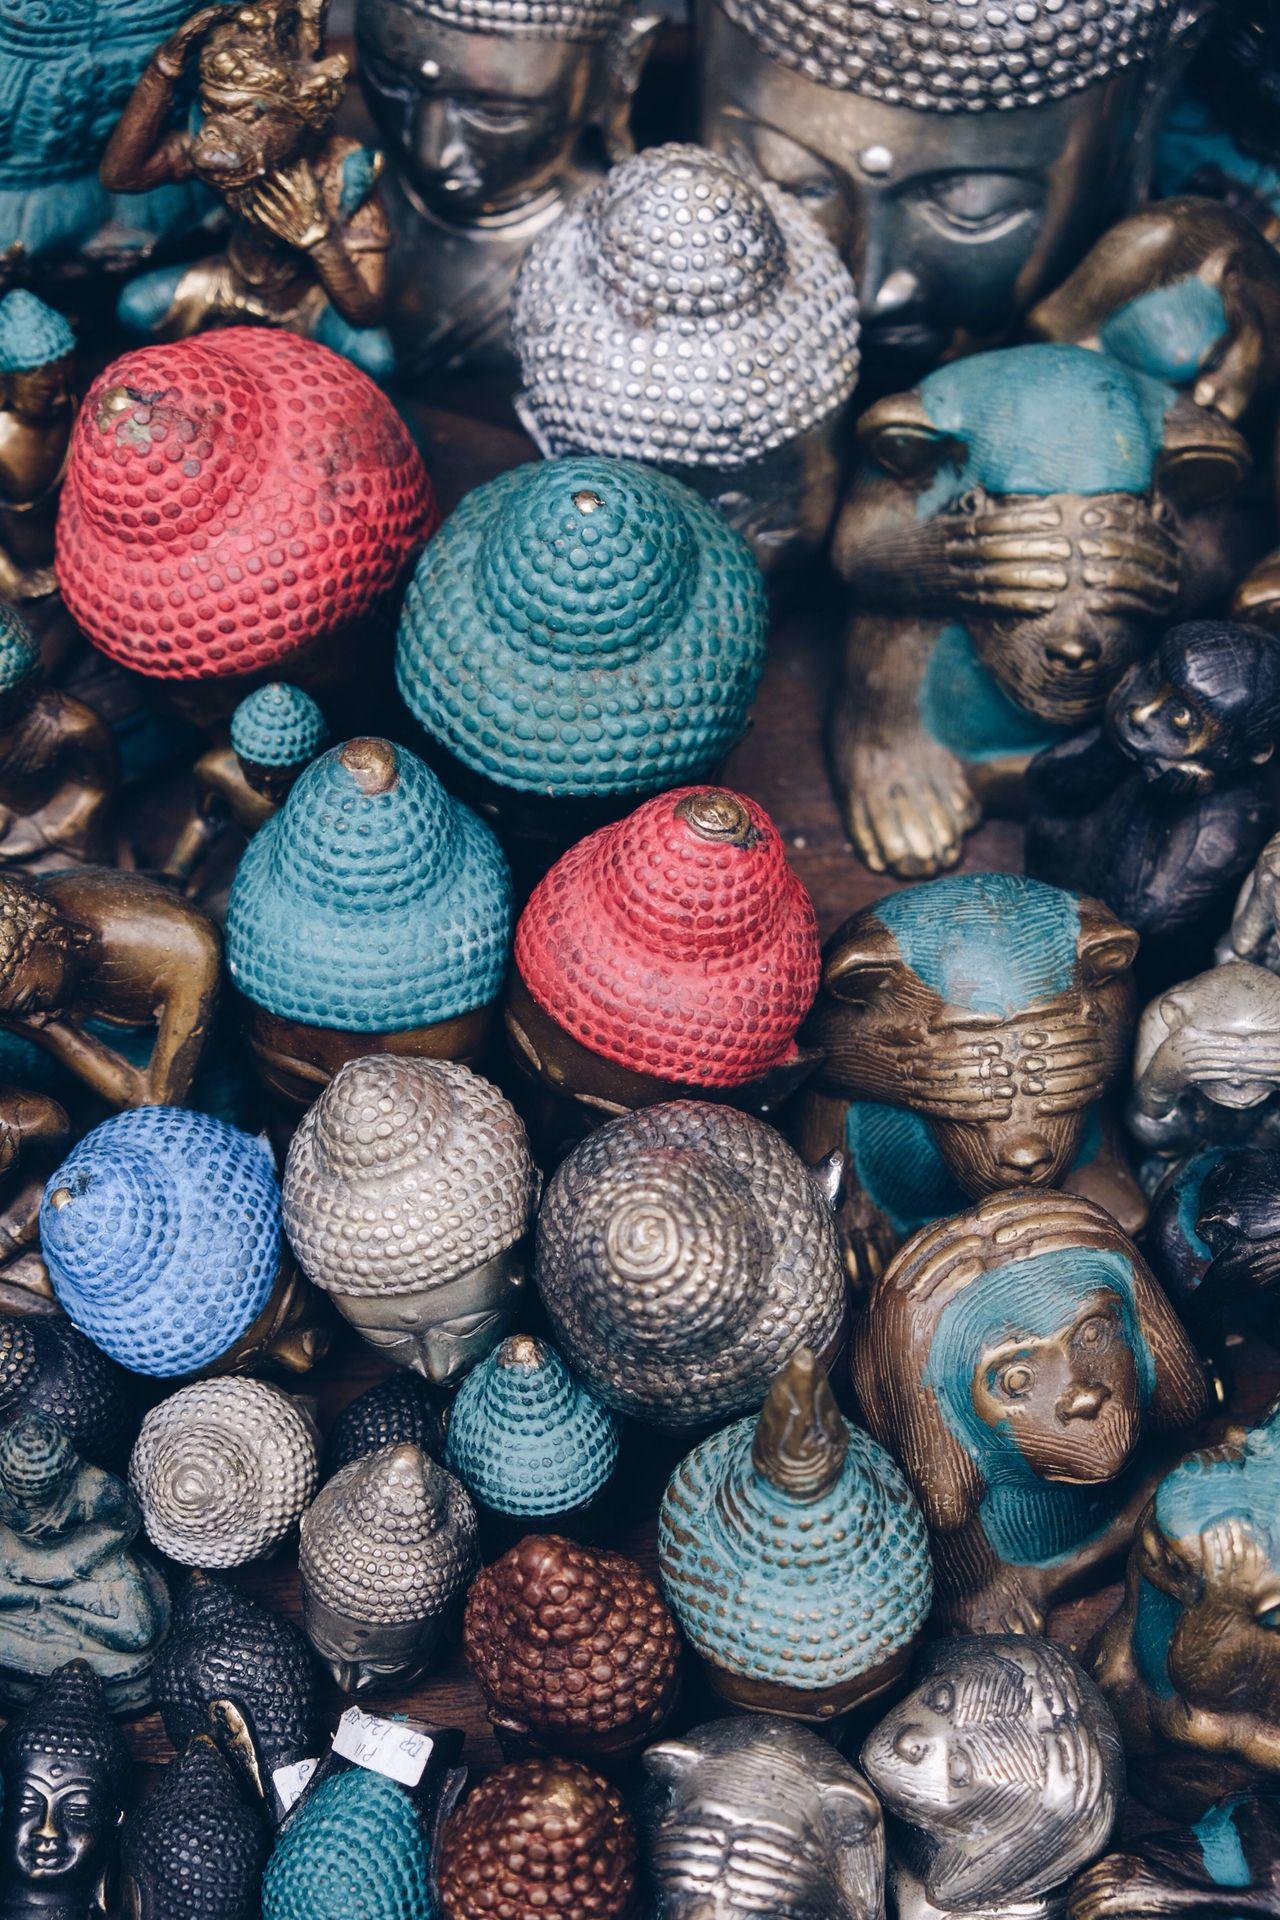 Large Group Of Objects Backgrounds Multi Colored No People Close-up Souvenir Bali Ubud INDONESIA Variation Full Frame Monkey Buddha EyeEmNewHere